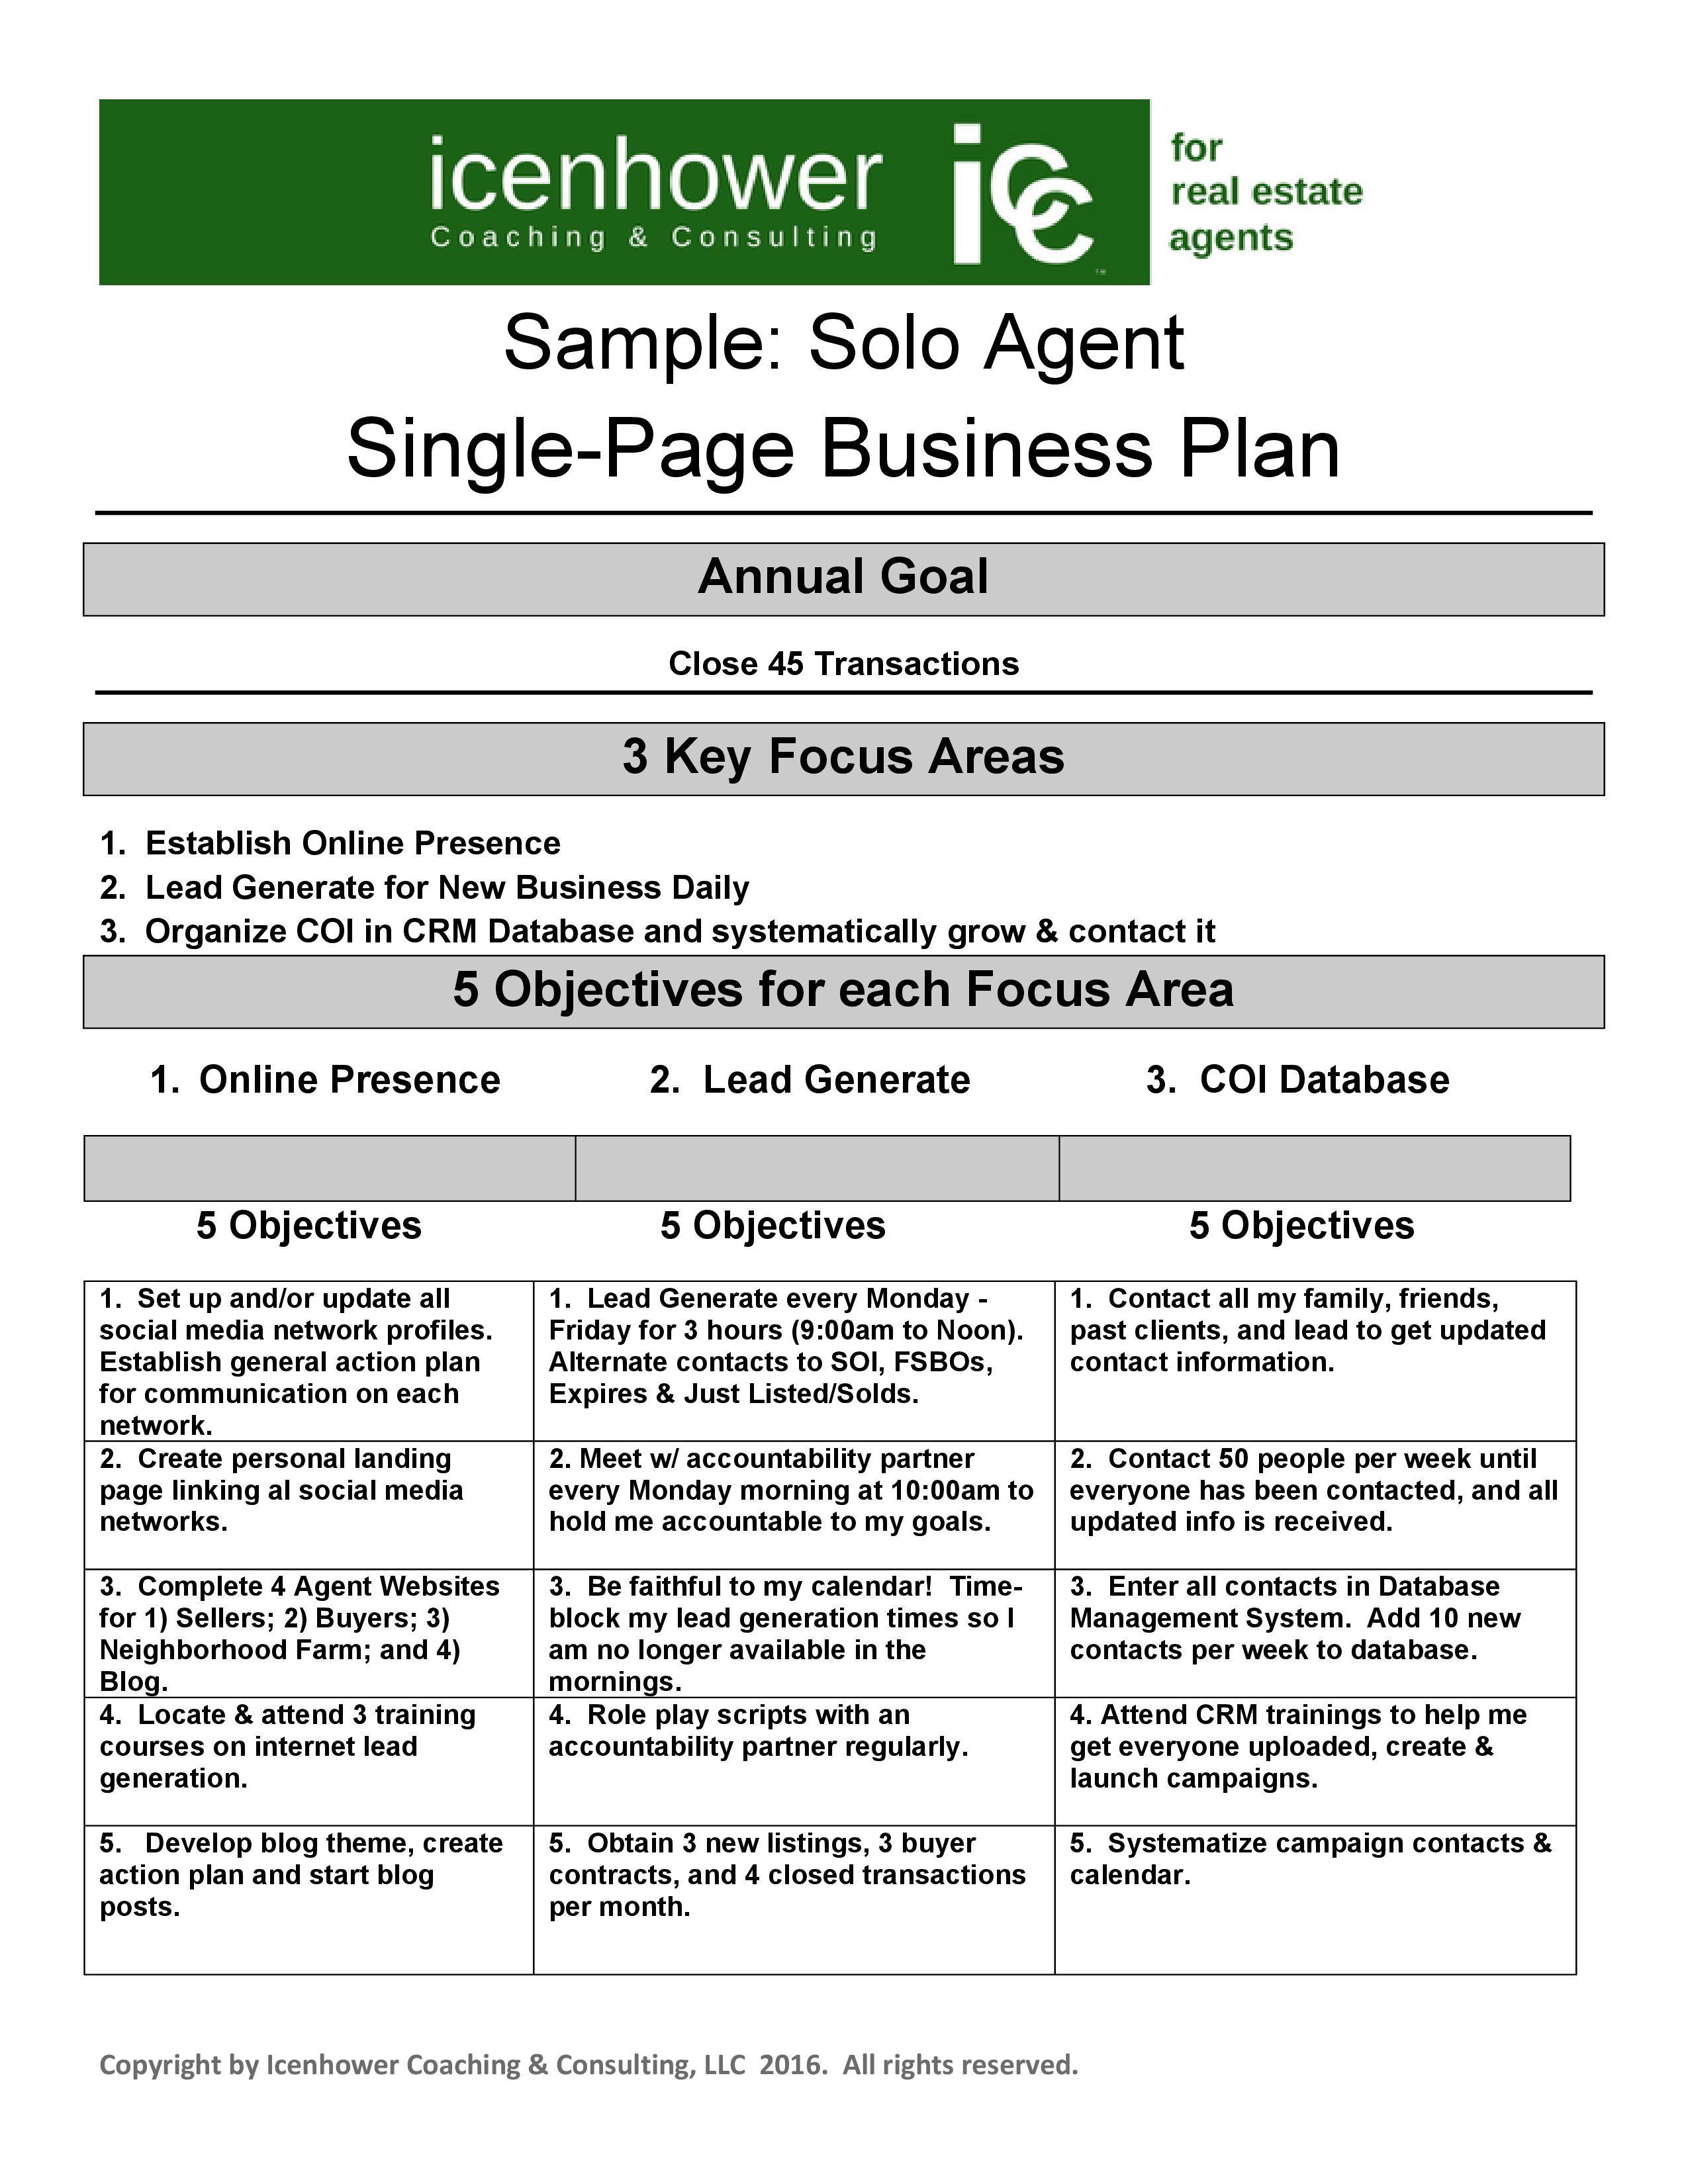 007 Astounding Real Estate Busines Plan Template Image  Example Free InvestorFull